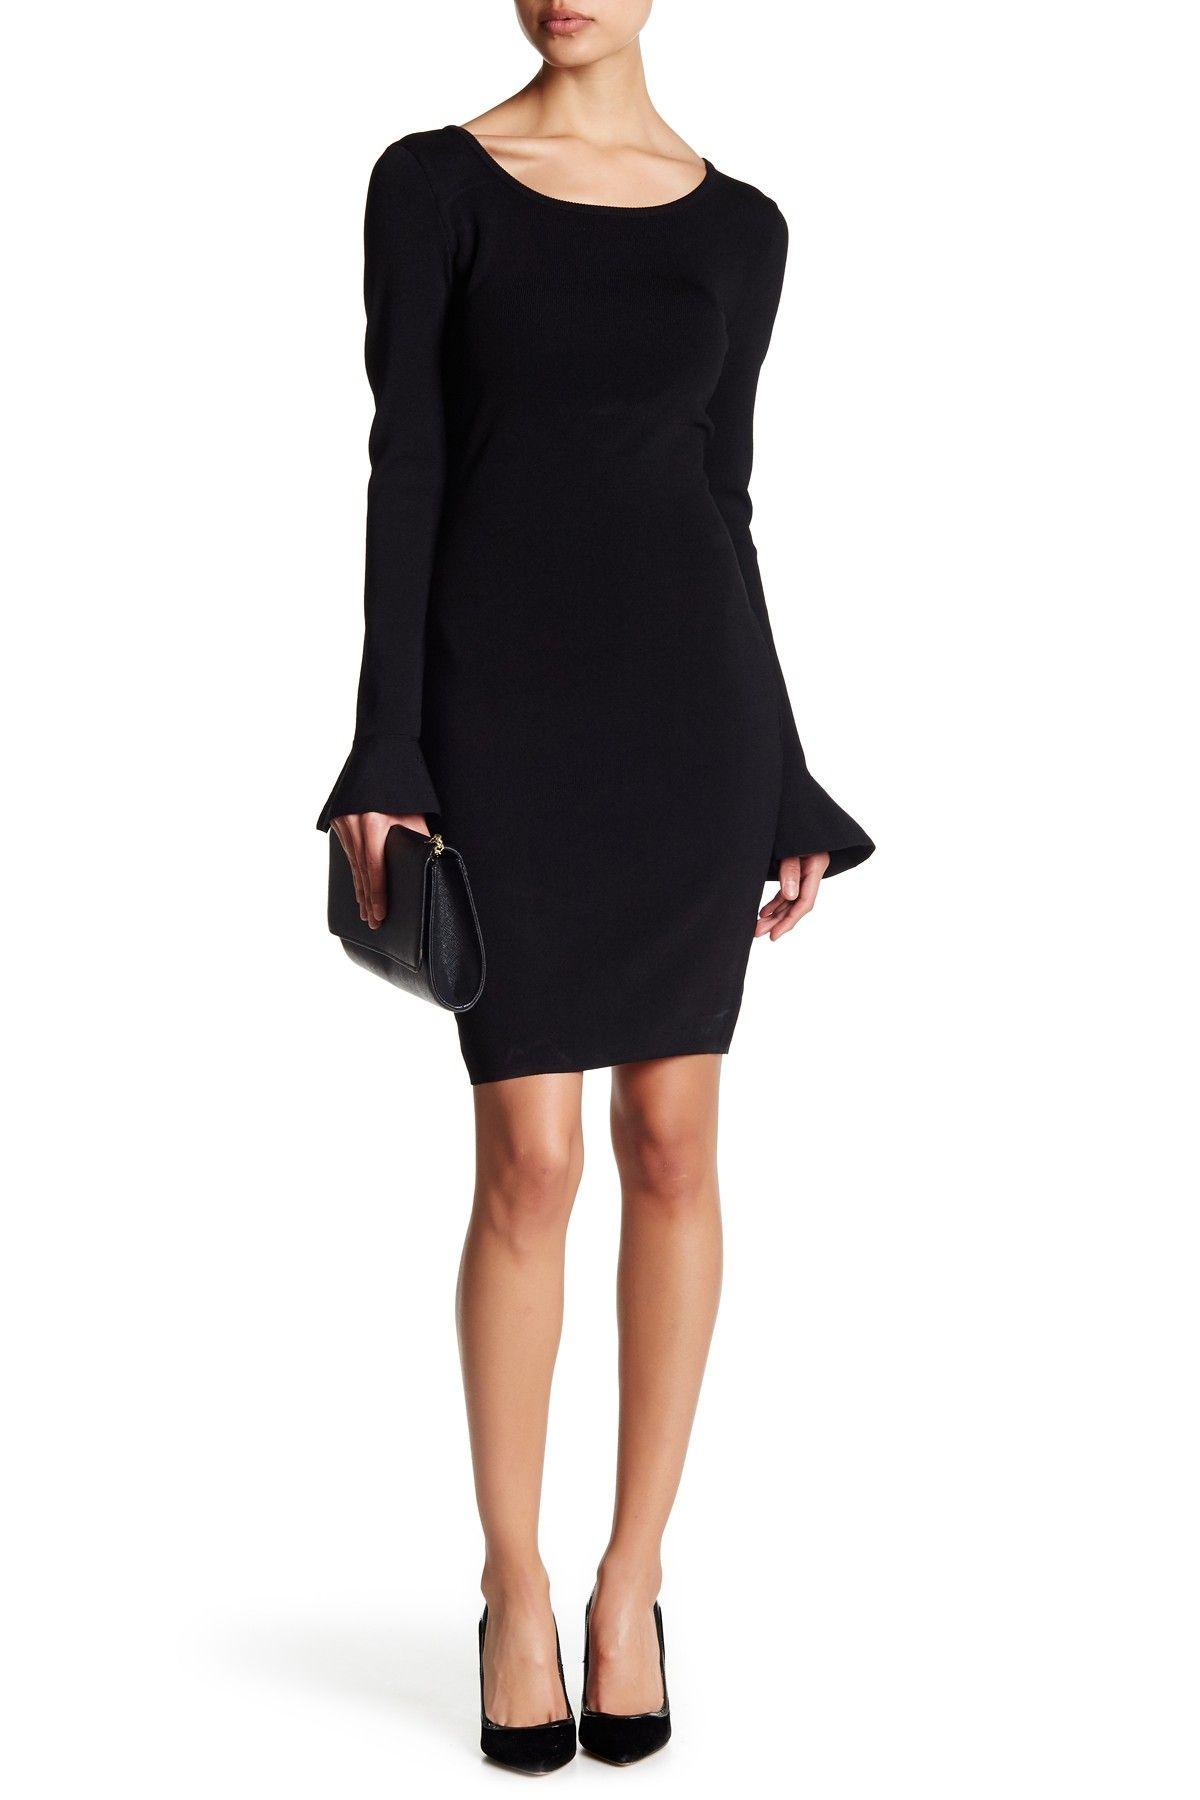 4674b22f6c0 Long Sleeve Bodycon Dress Nordstrom